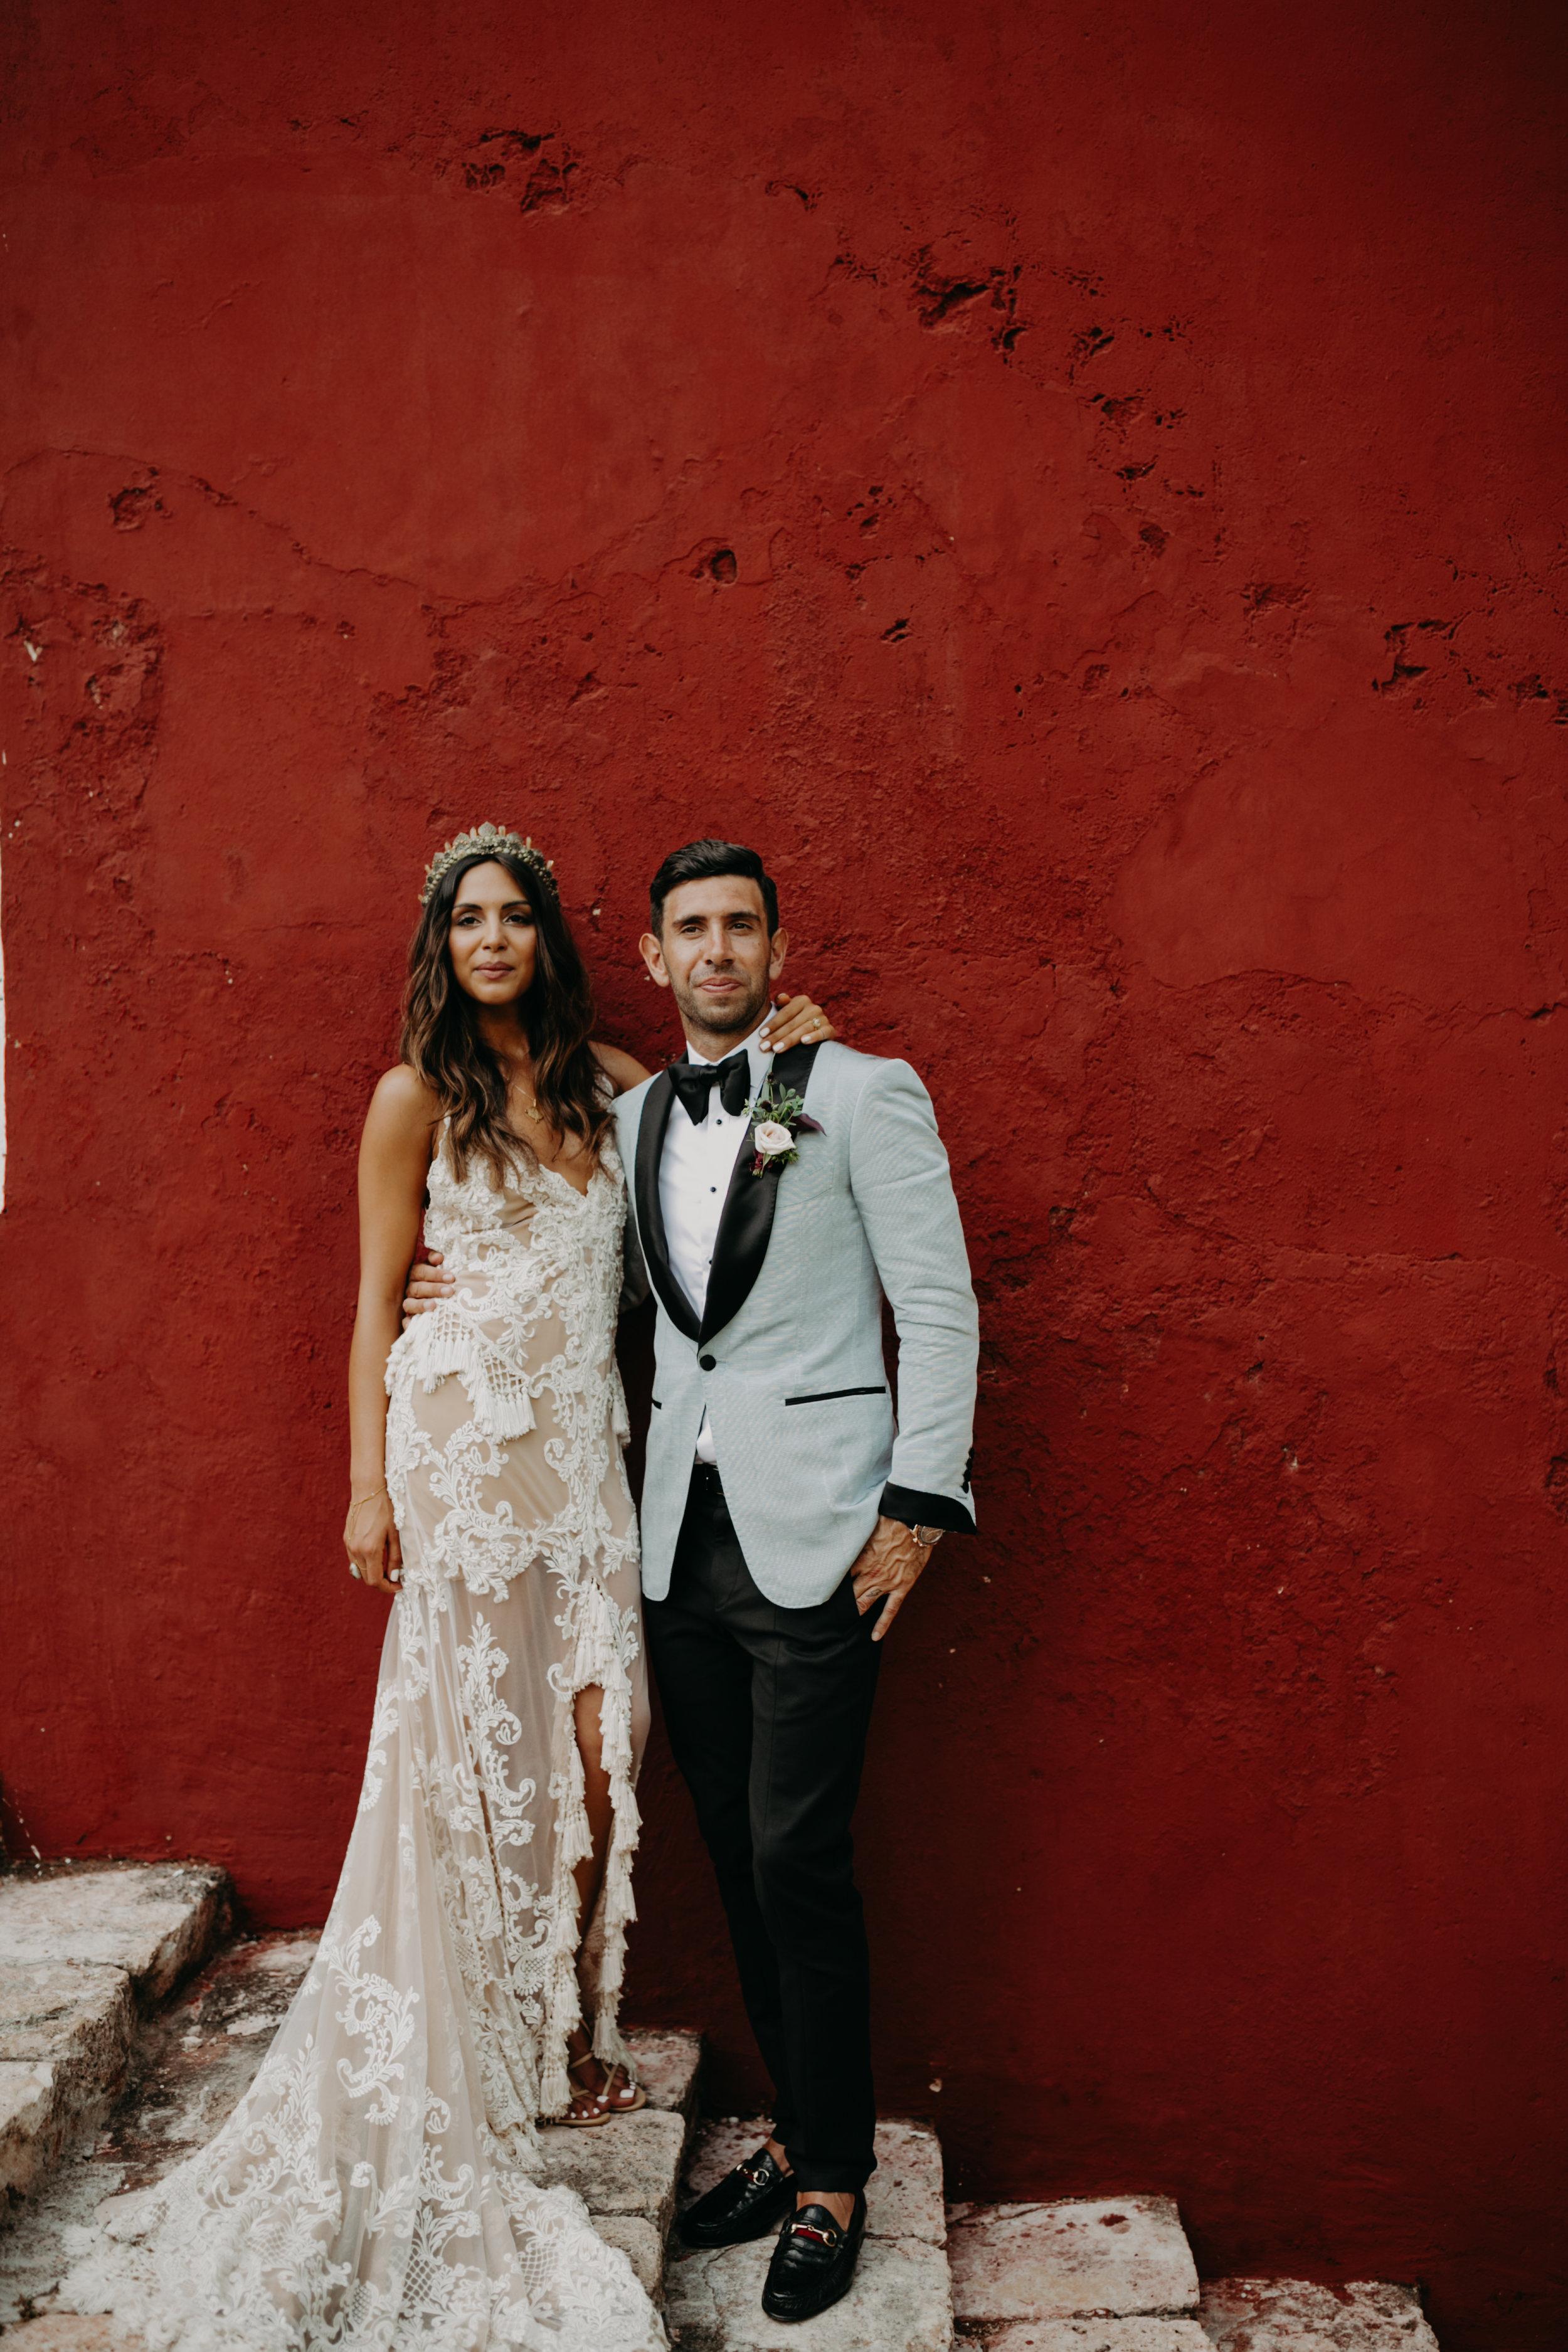 Hacienda Temozon Yucatan Mexico Wedding | Ida & Peter Emily Magers Photography-712.jpg